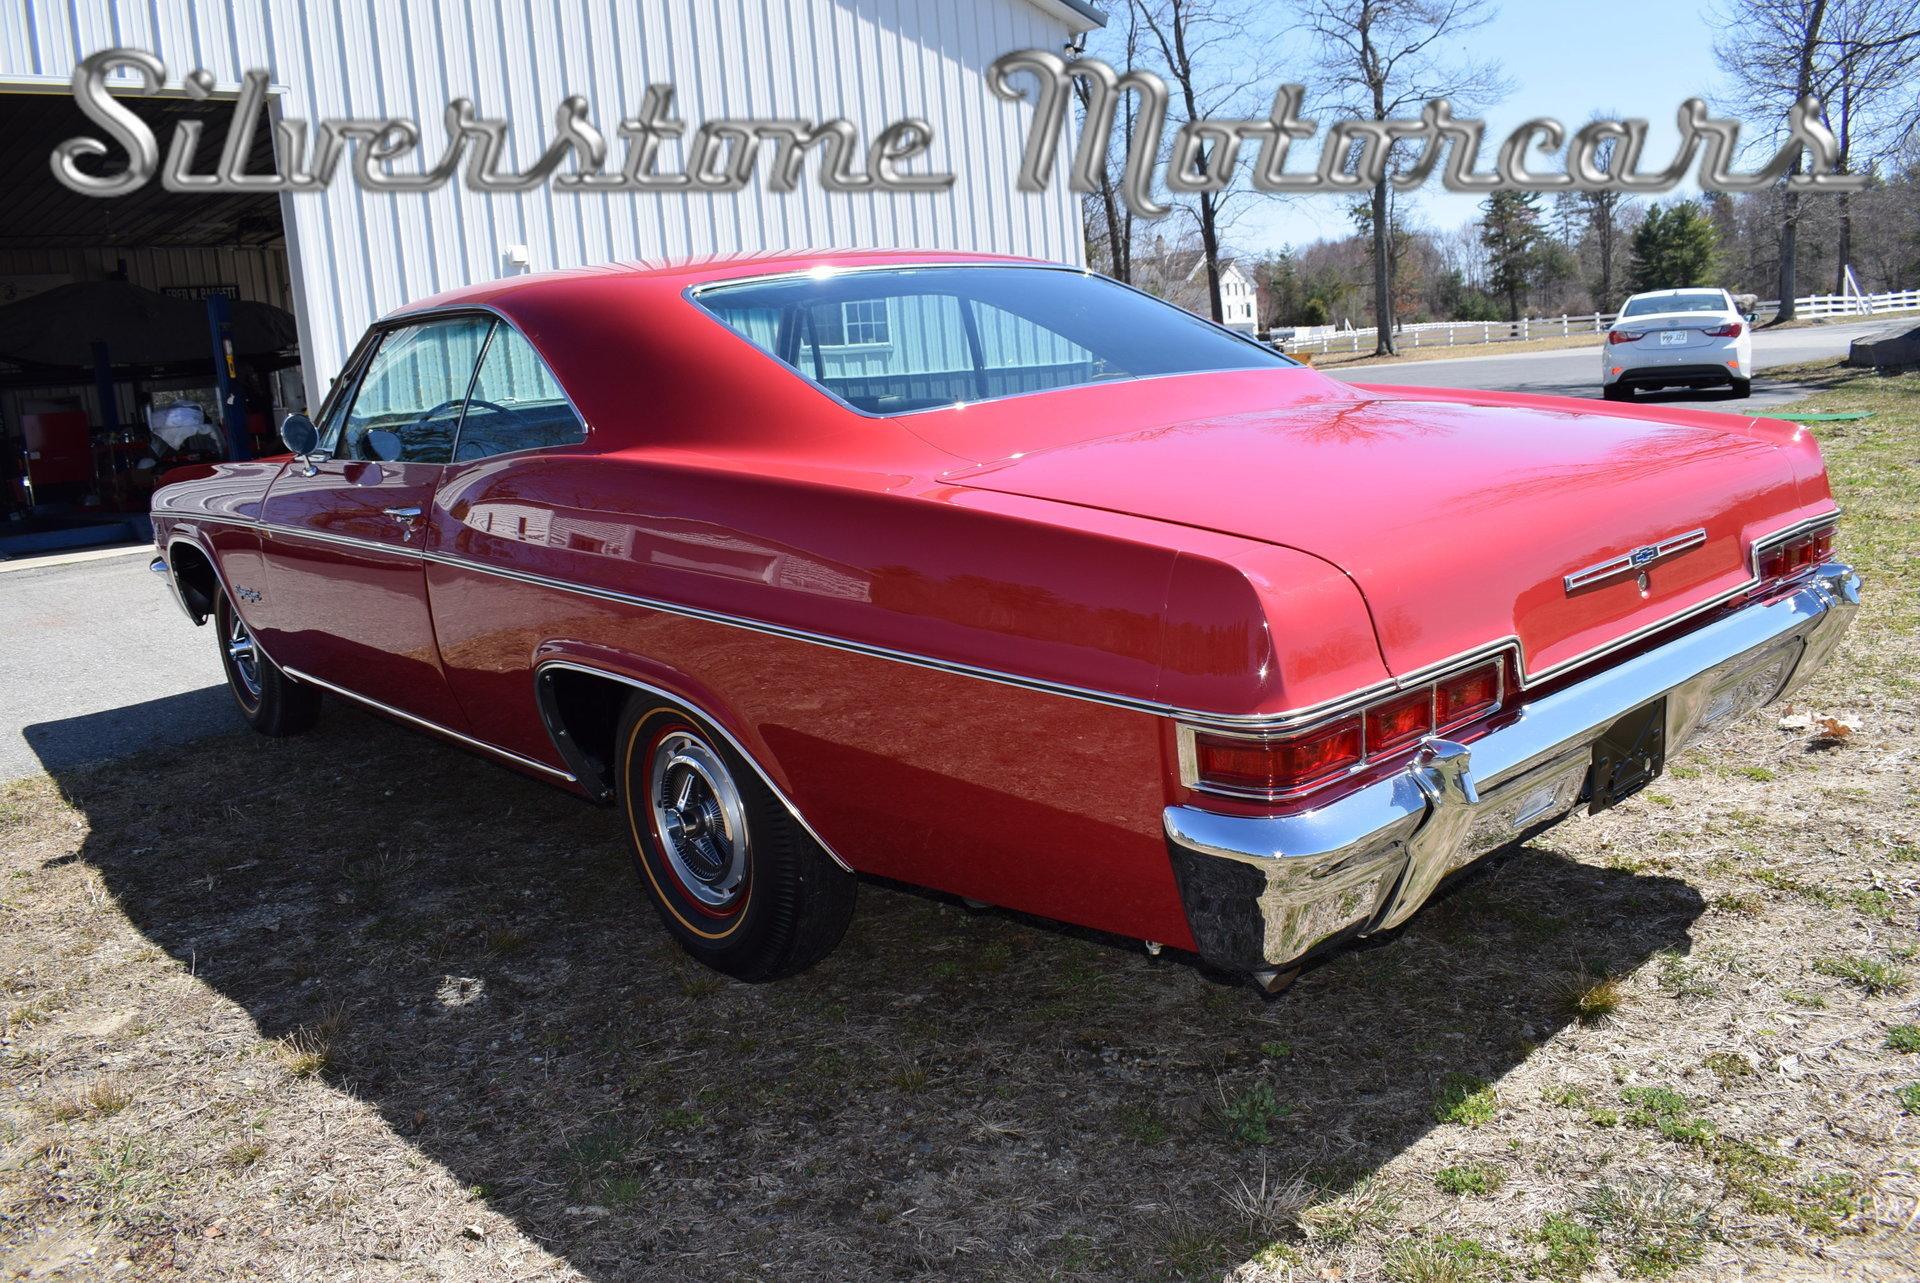 1966 Chevrolet Impala Silverstone Motorcars Ss